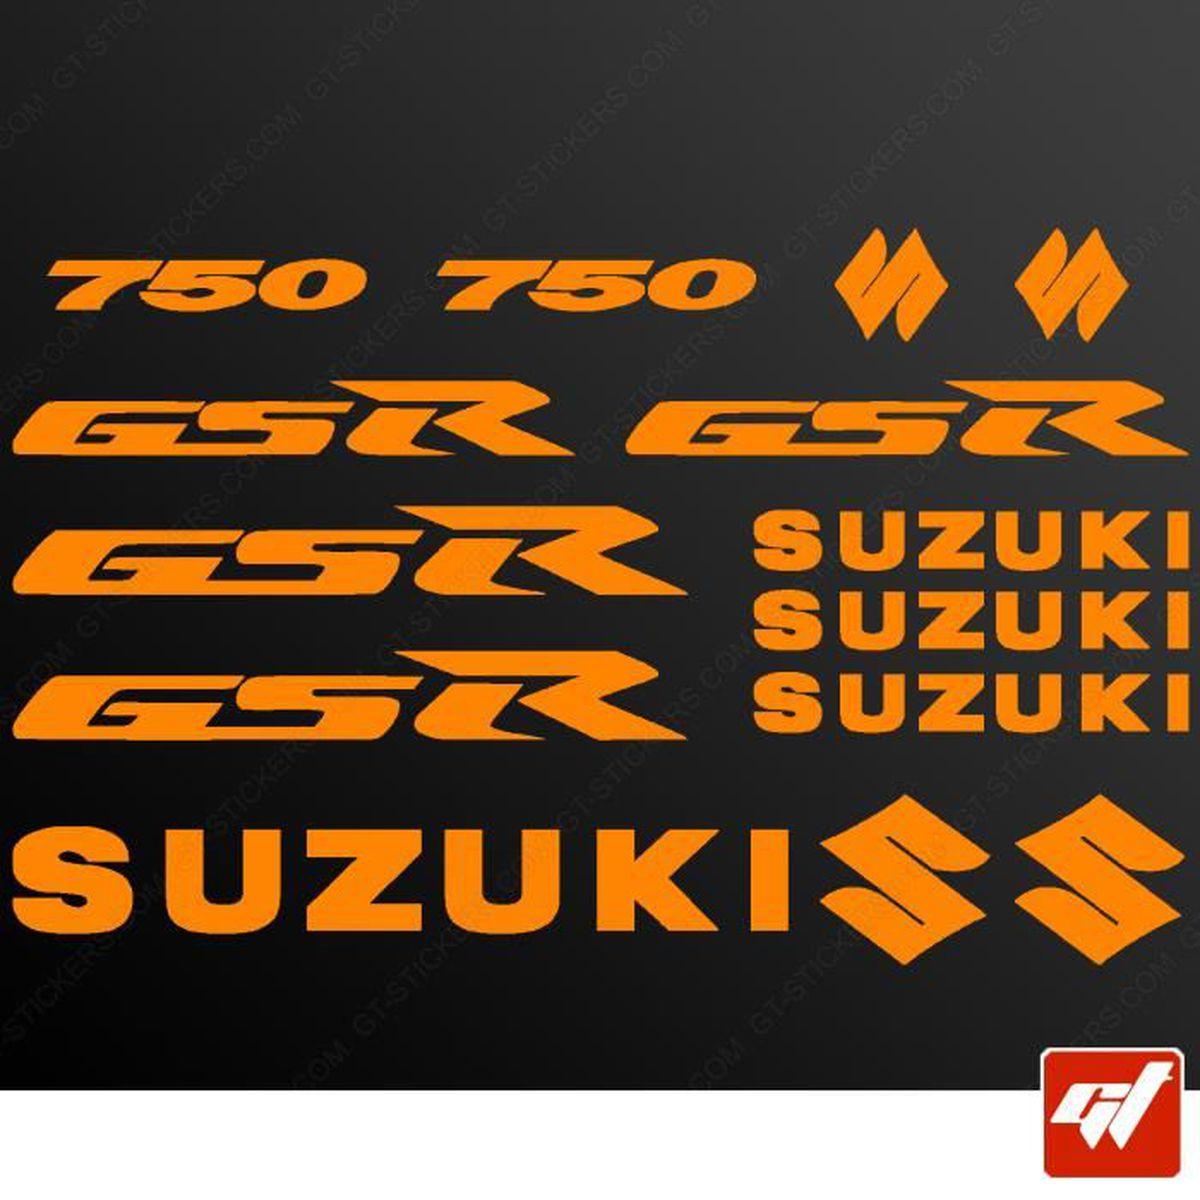 AUTOCOLLANTS GSR 750 SUZUKI STICKERS MOTO  STICKER AUTOCOLLANT AU CHOIX